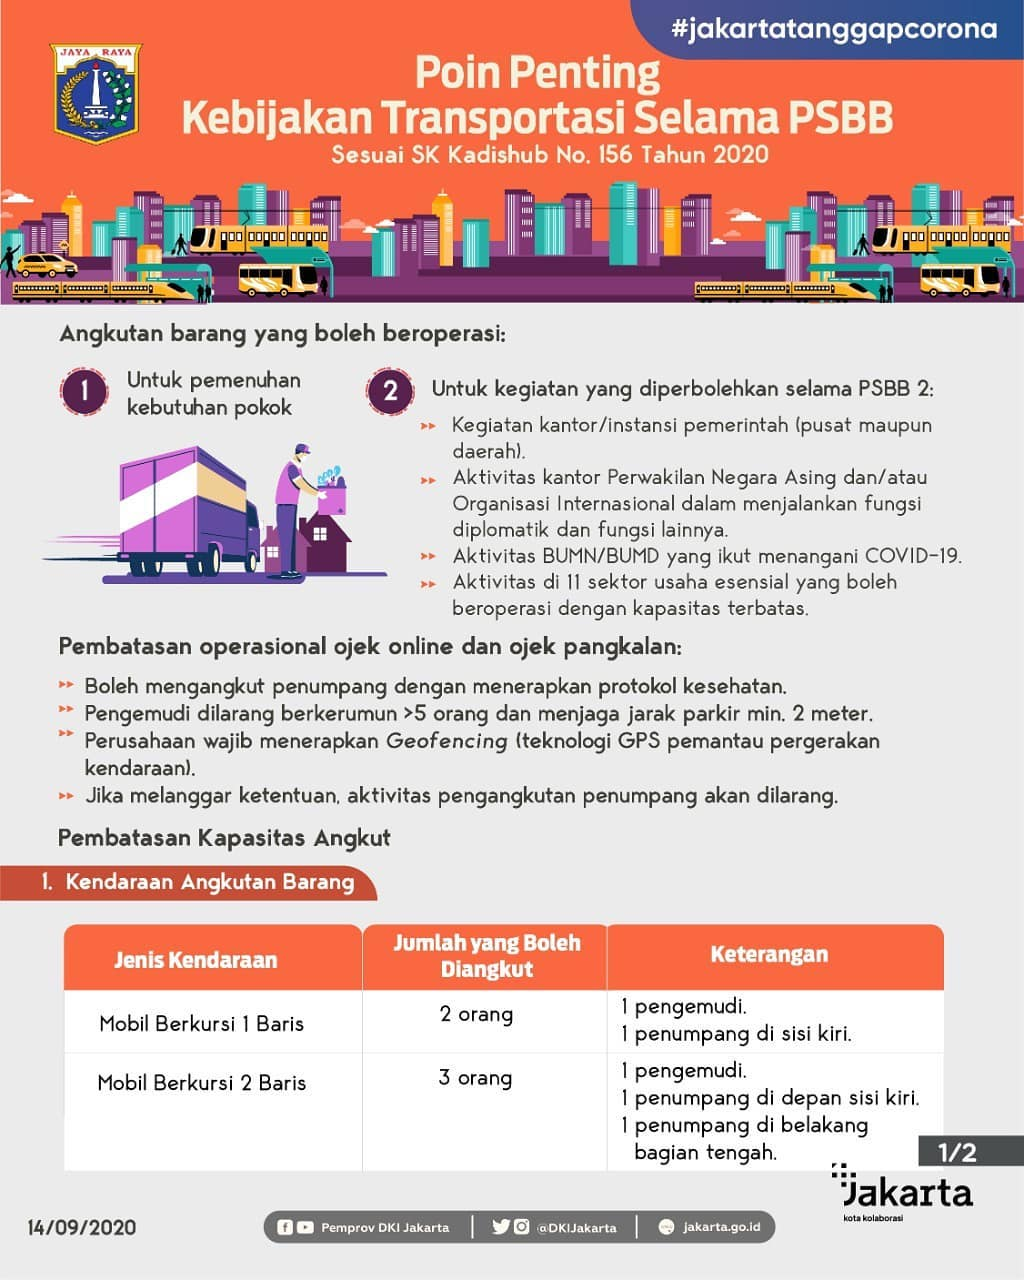 Point Penting Kebijakan Transportasi Selama PSBB-Slide_1